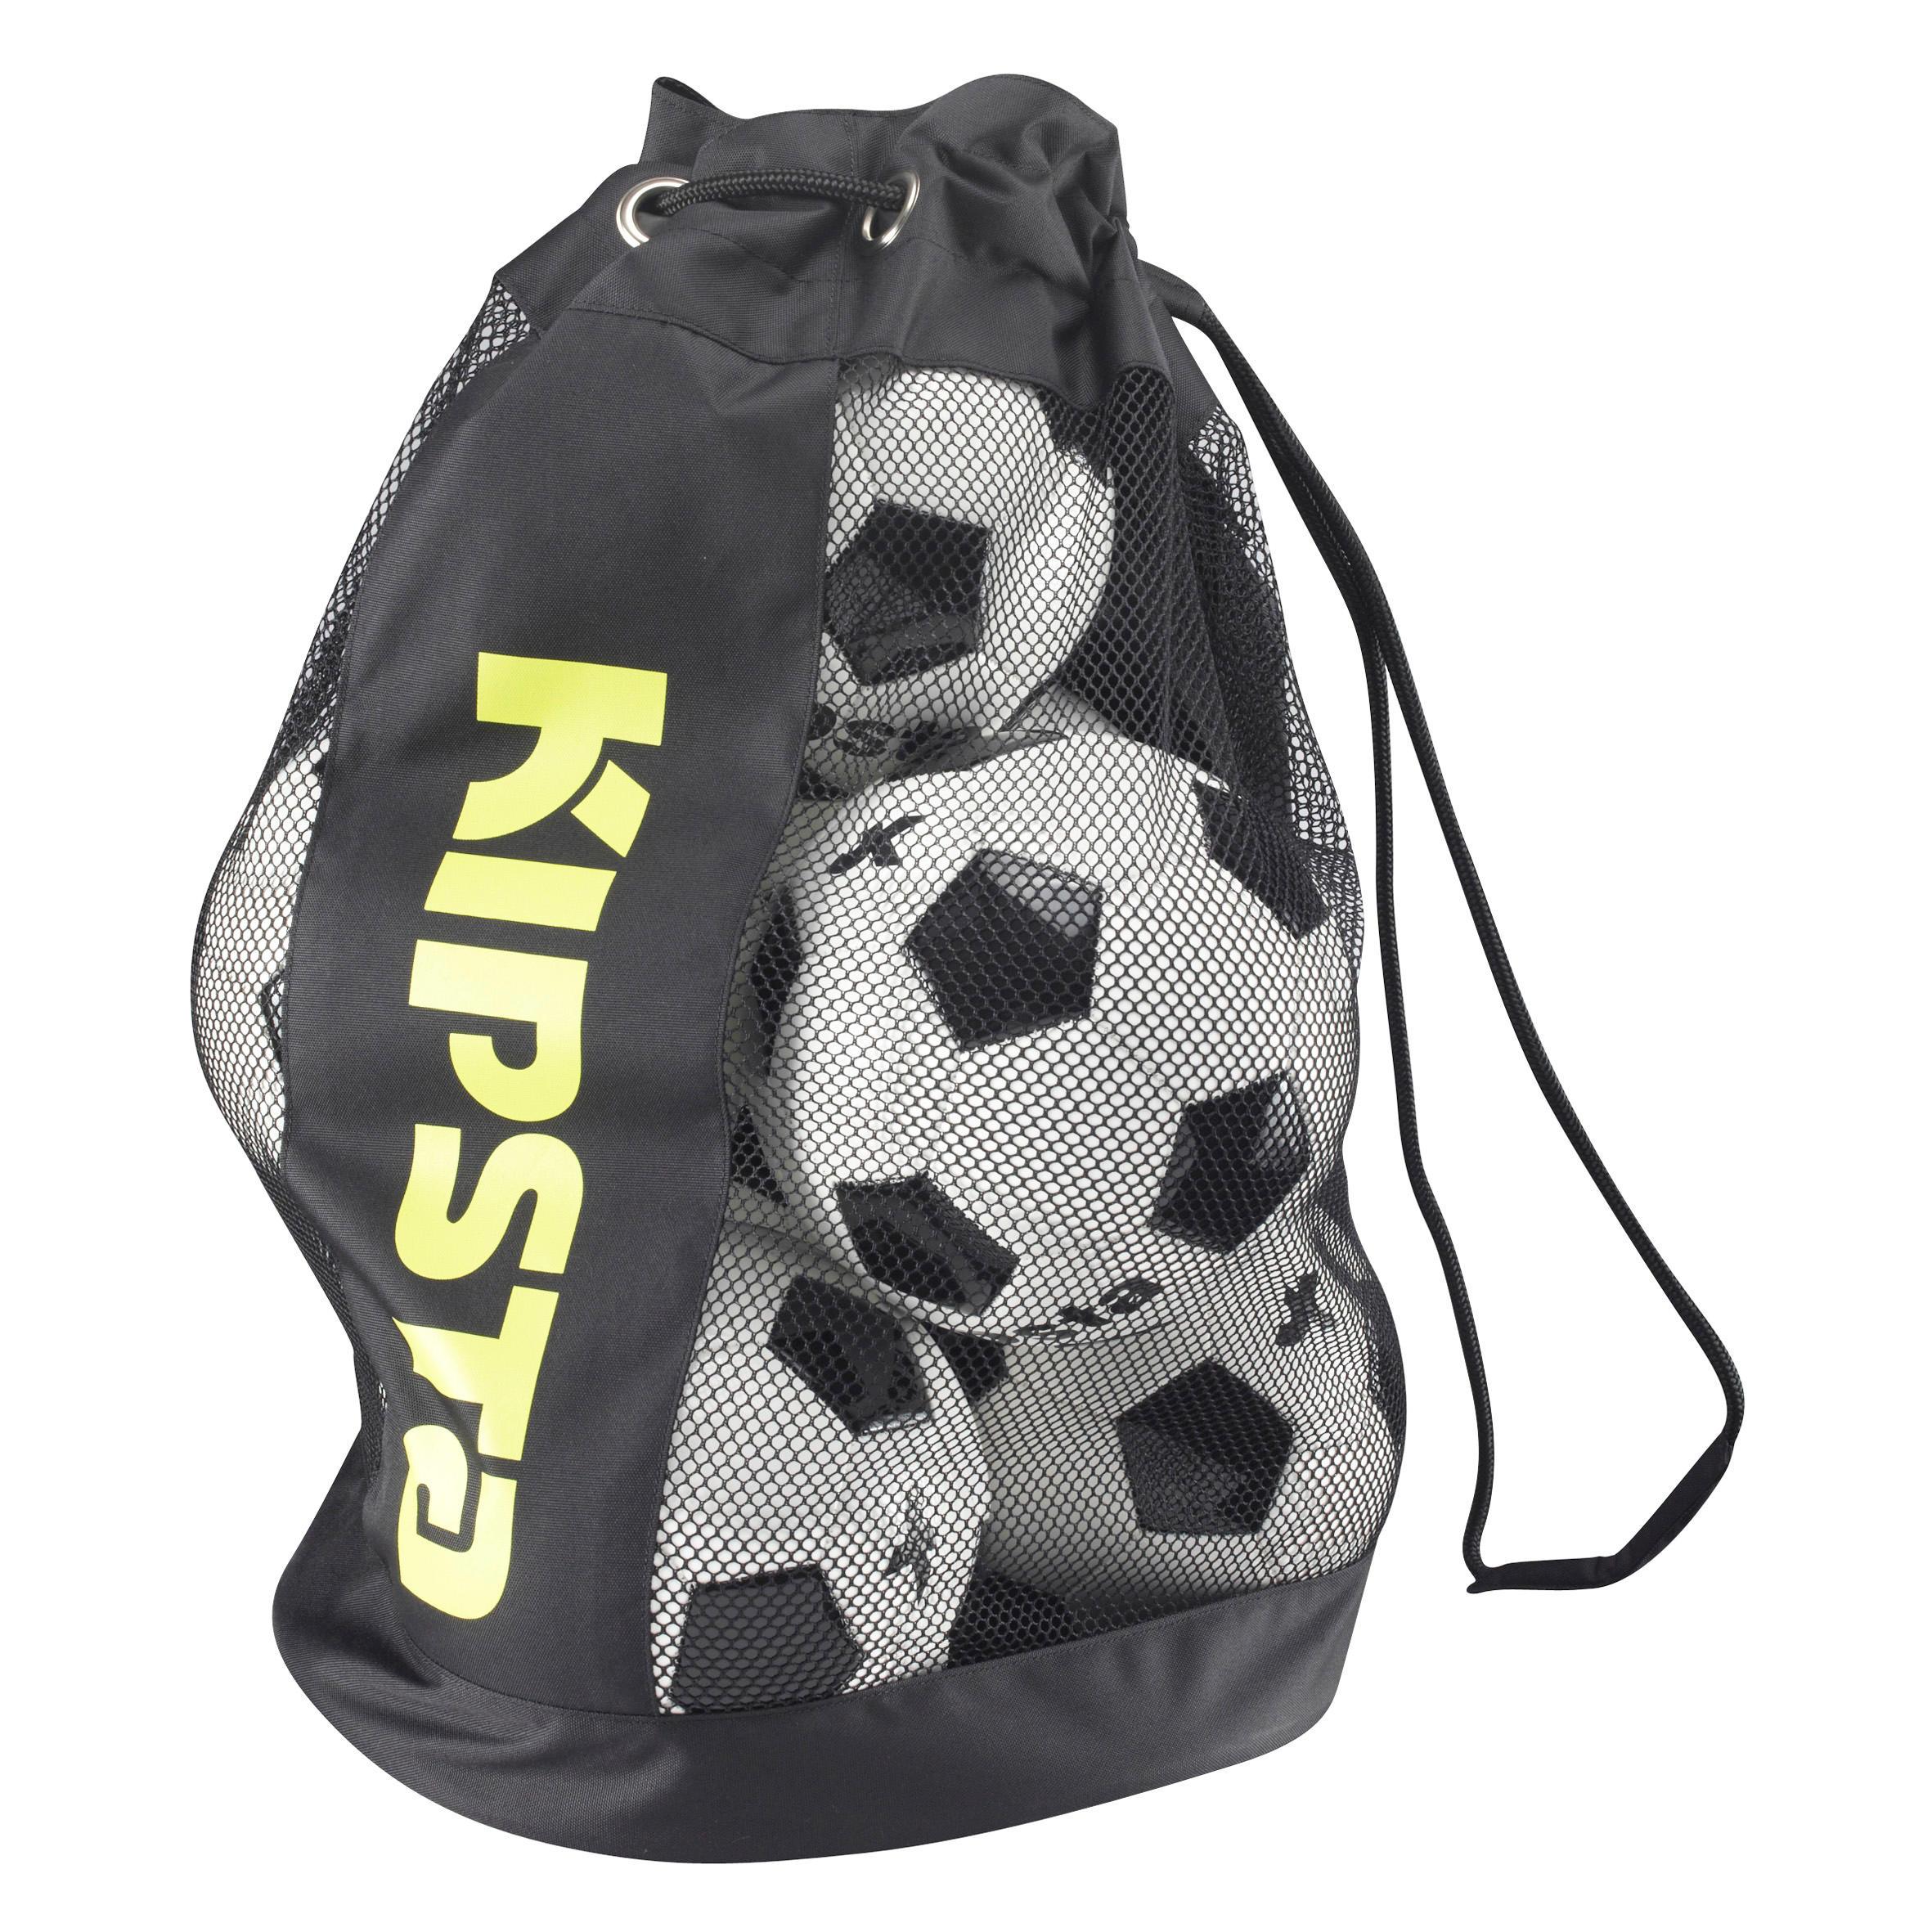 Soccer 8-Ball Bag - Black Yellow